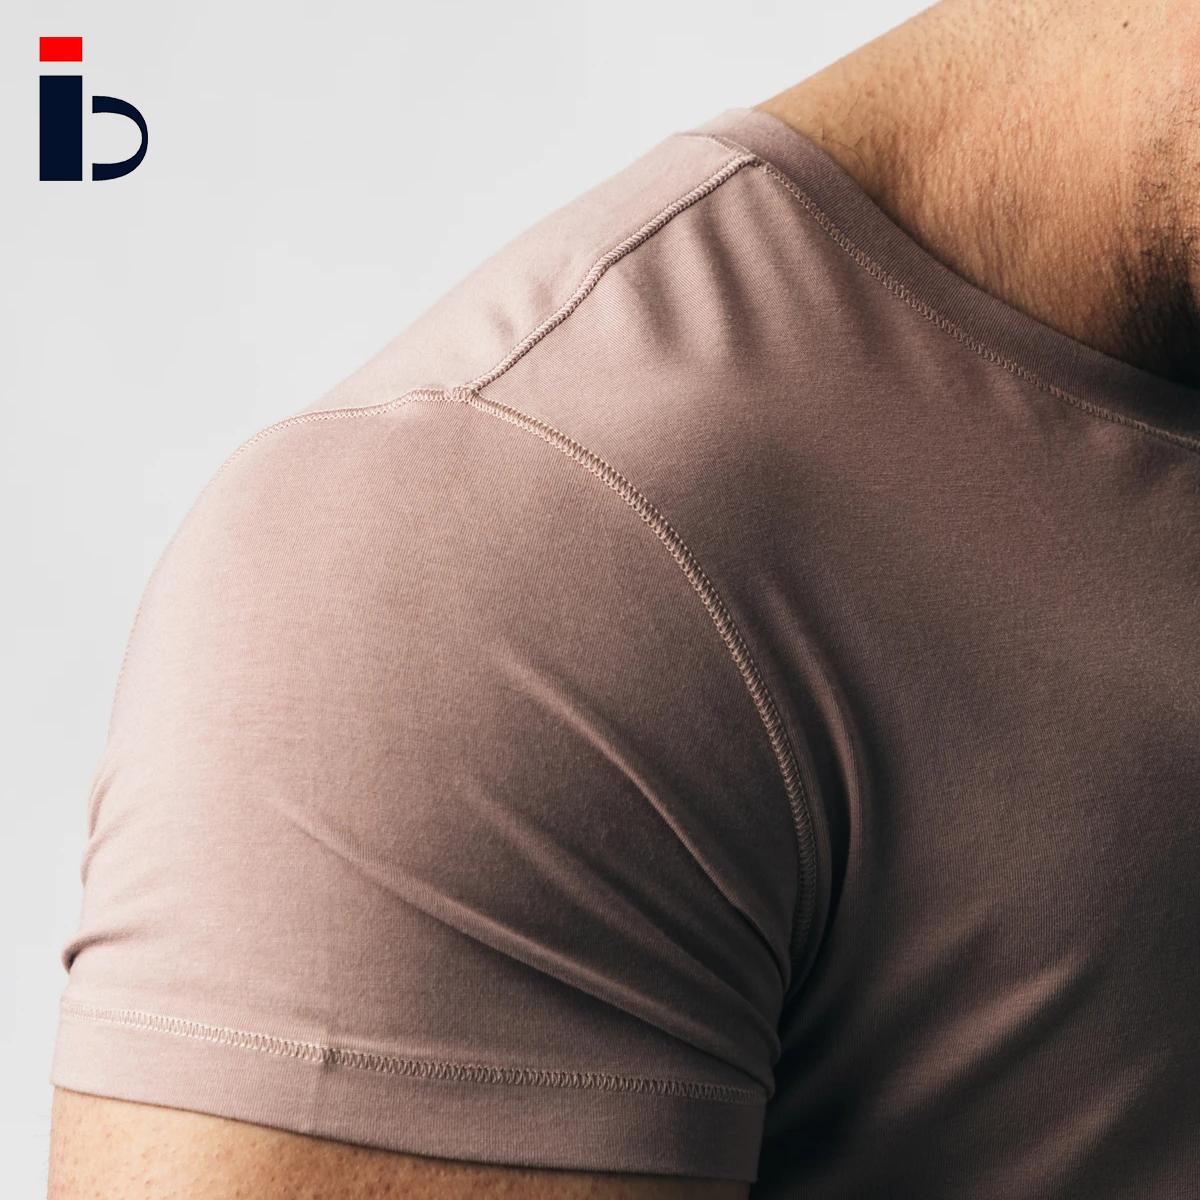 Gym fitness workout basic cotton running short sleeve crew neck t-shirt for men